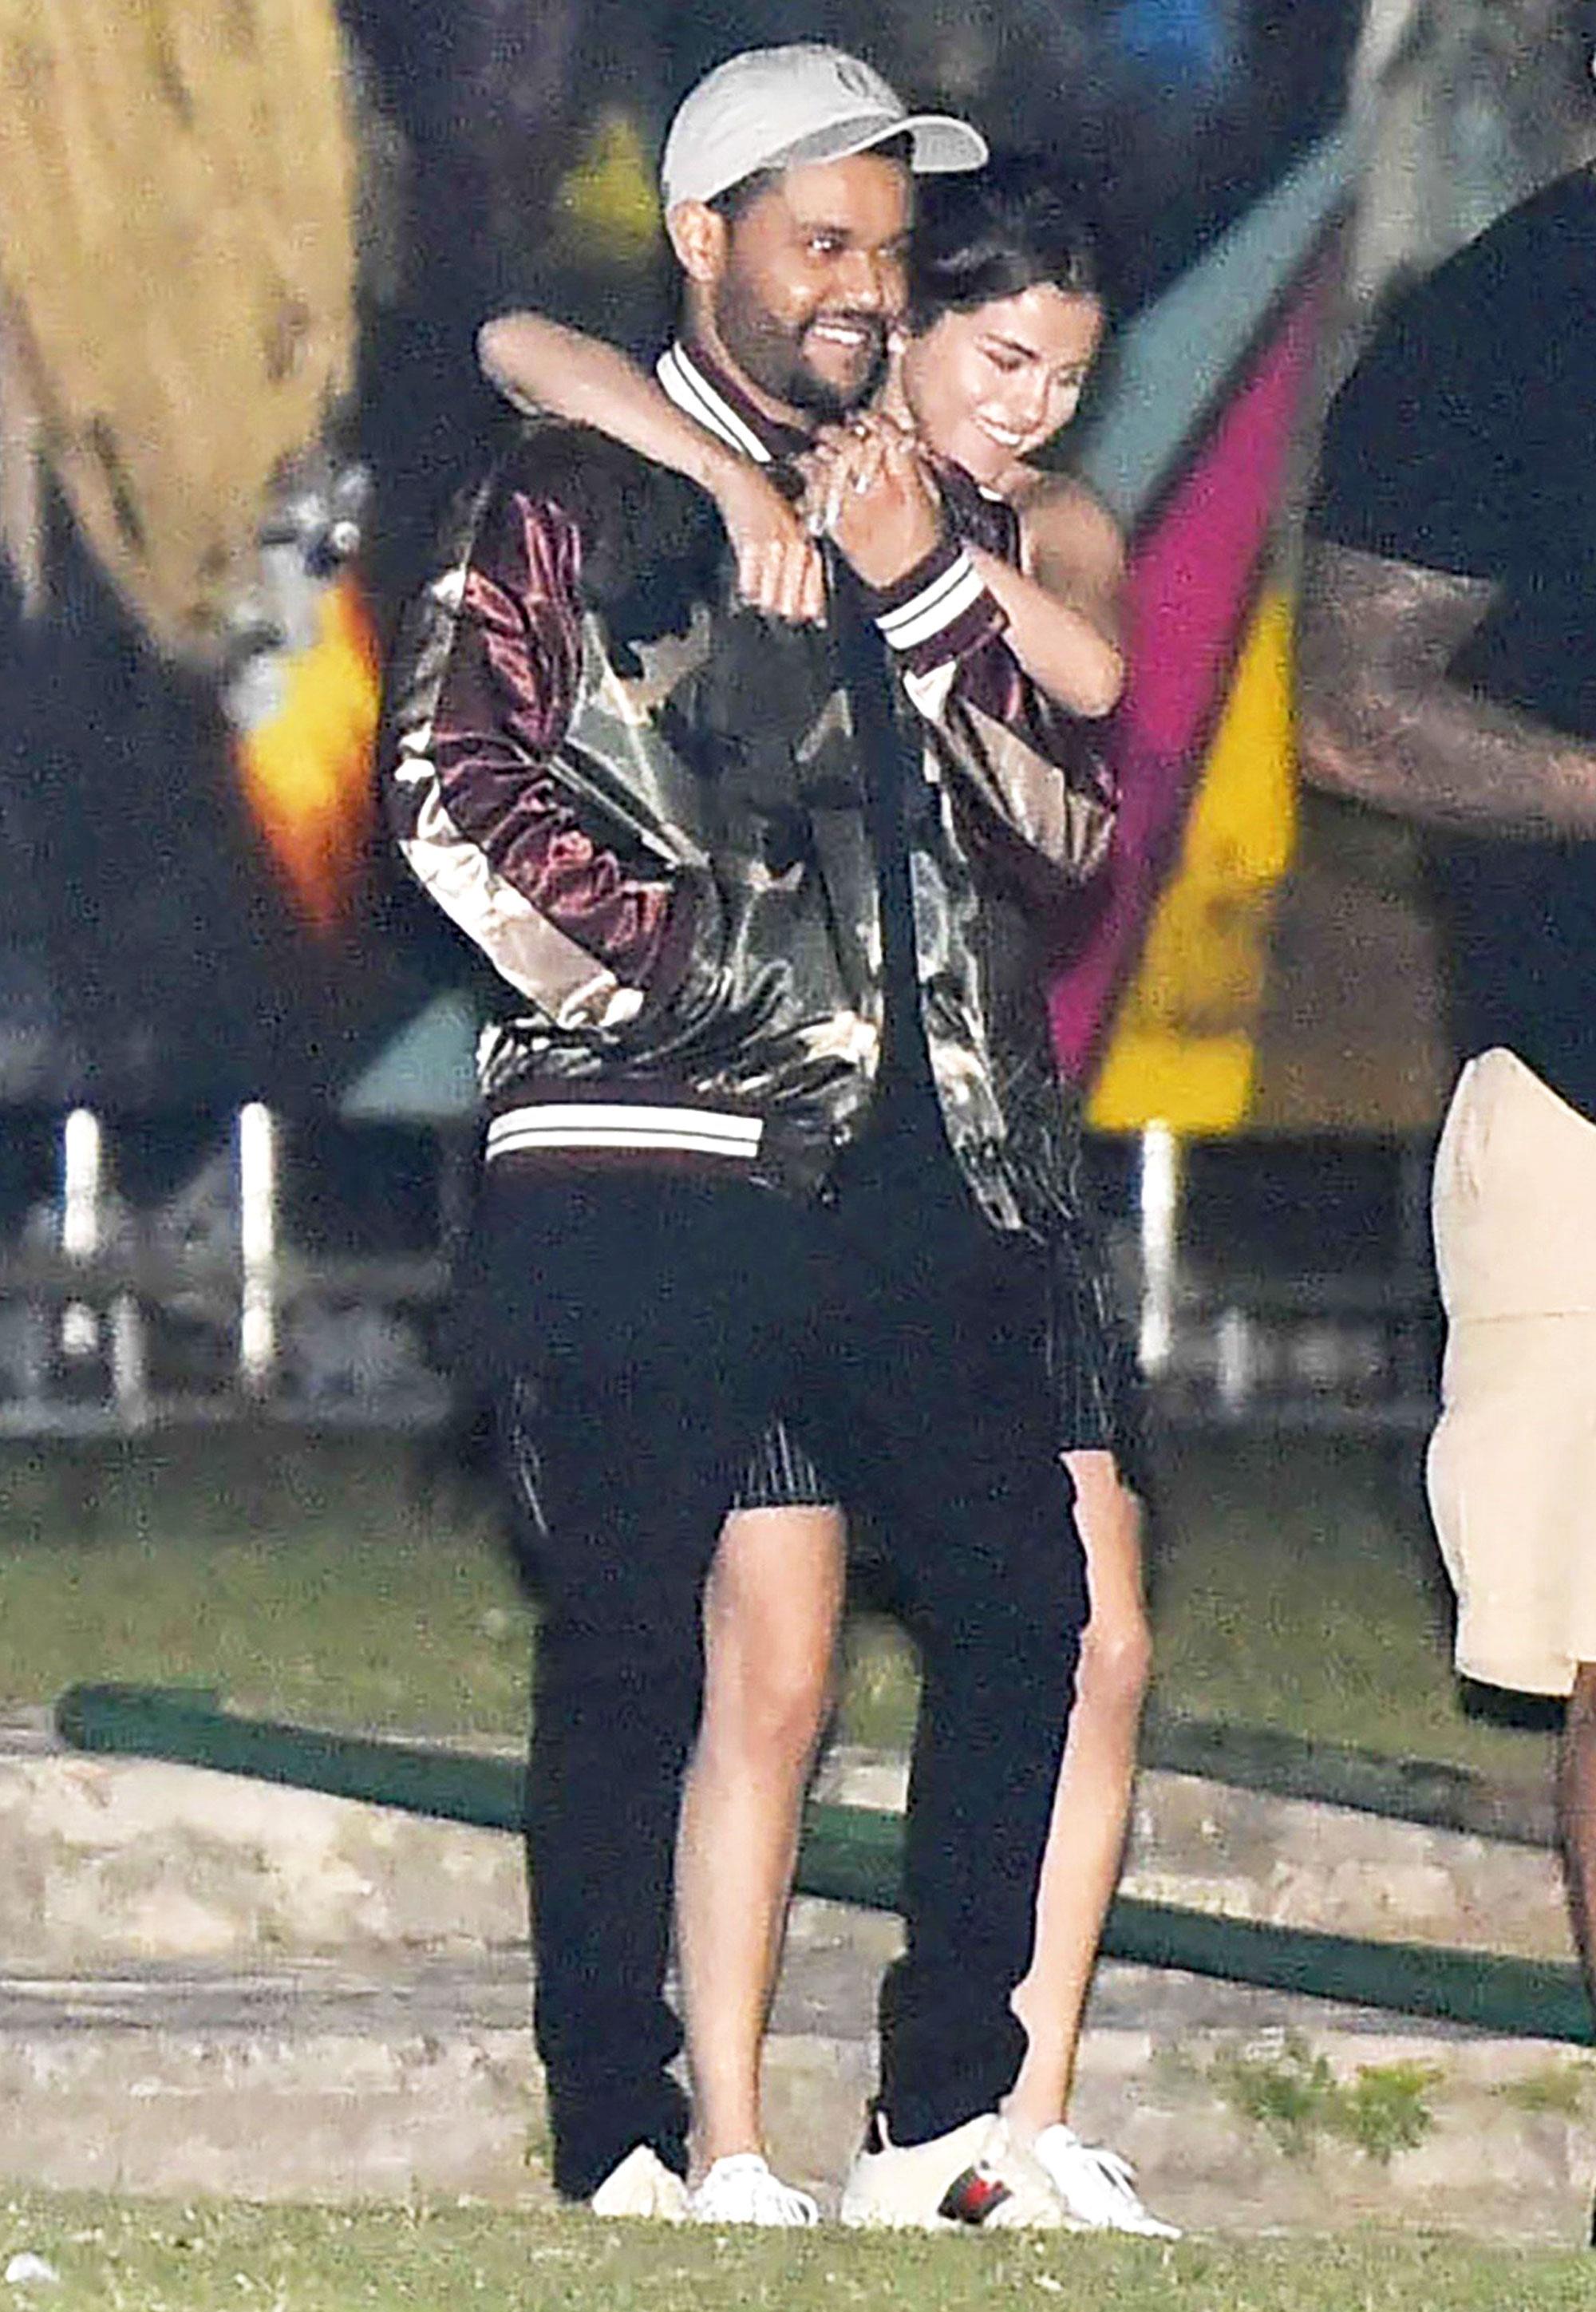 Selena Gomez and The Weeknd